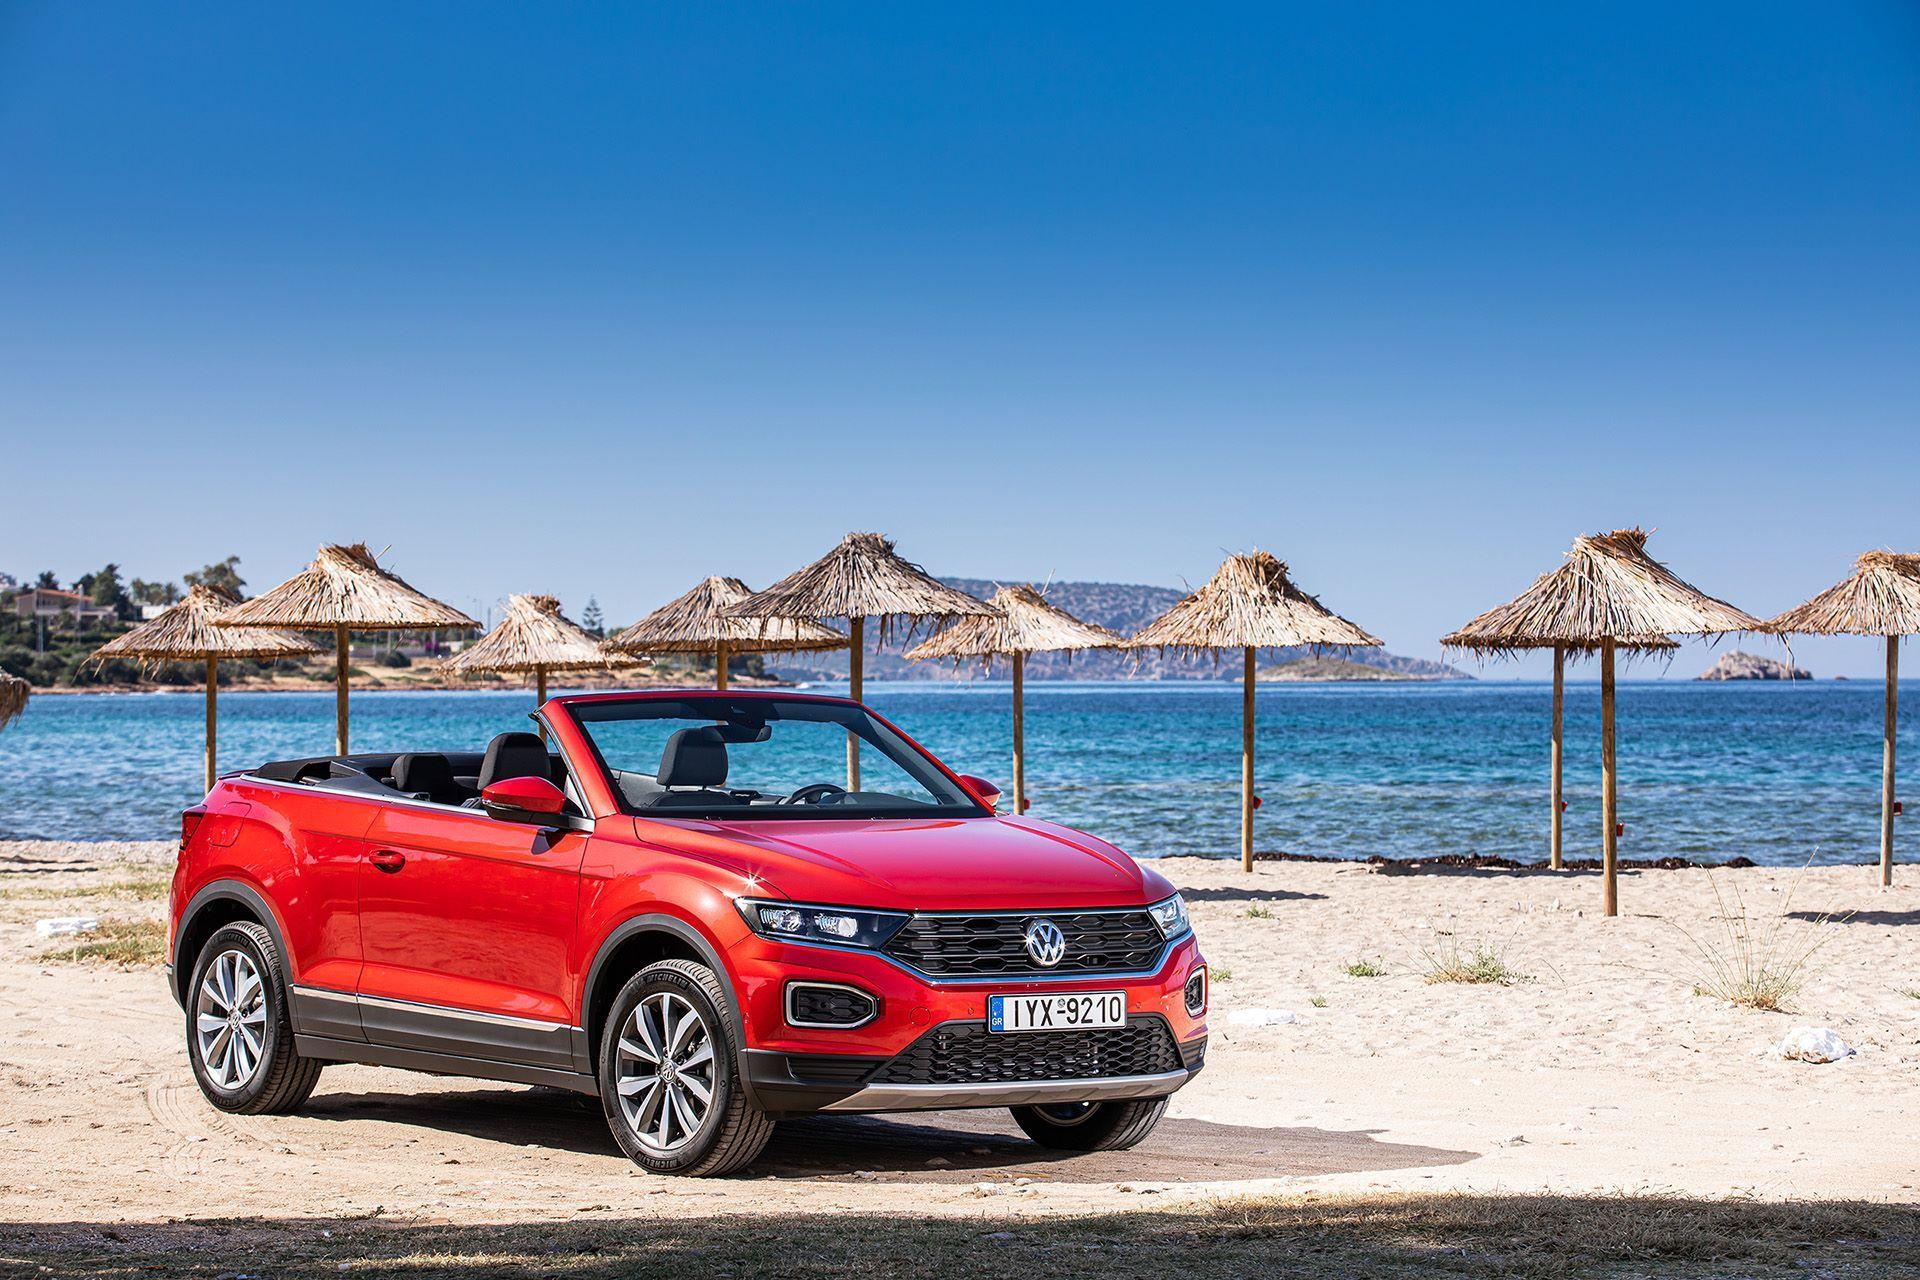 Volkswagen-T-Roc-Cabriolet-Greece-11